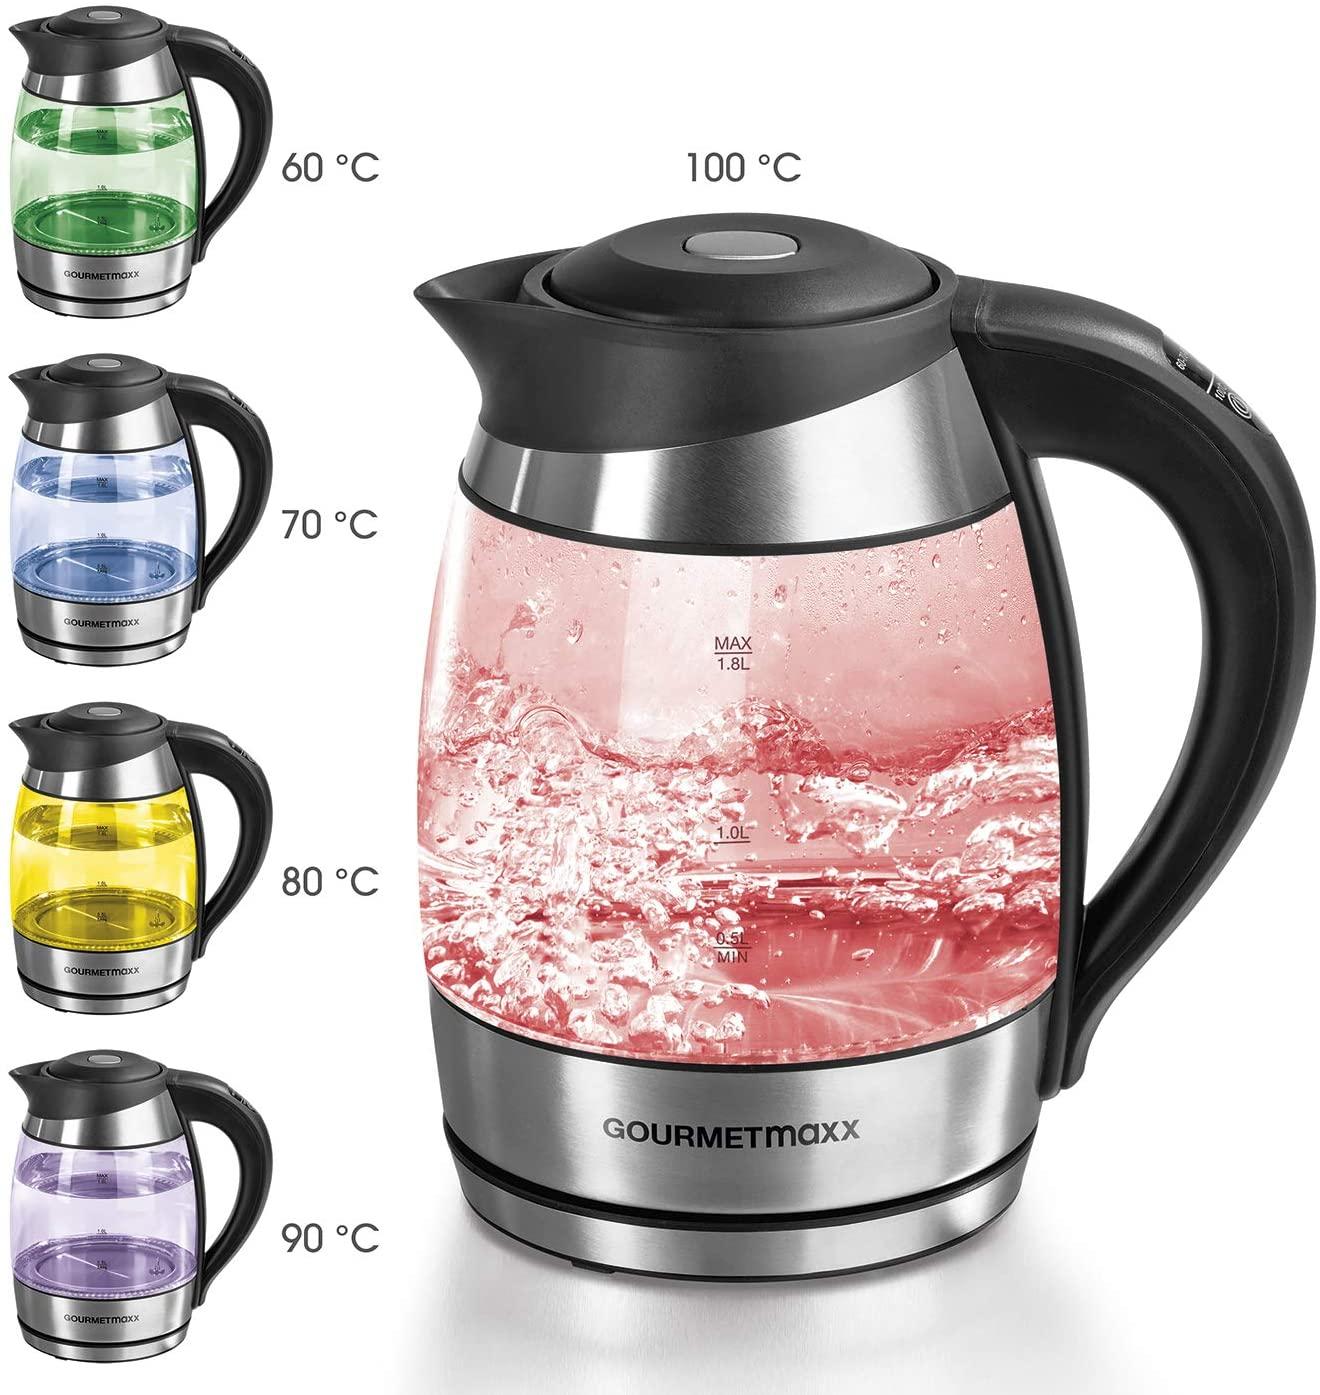 [B-Ware] GOURMETmaxx Glas-Wasserkocher mit Temperaturwahl (60/70/80/90/100°C, 1.7l, LED-Beleuchtung, 360°-Sockel, Abschaltautomatik)